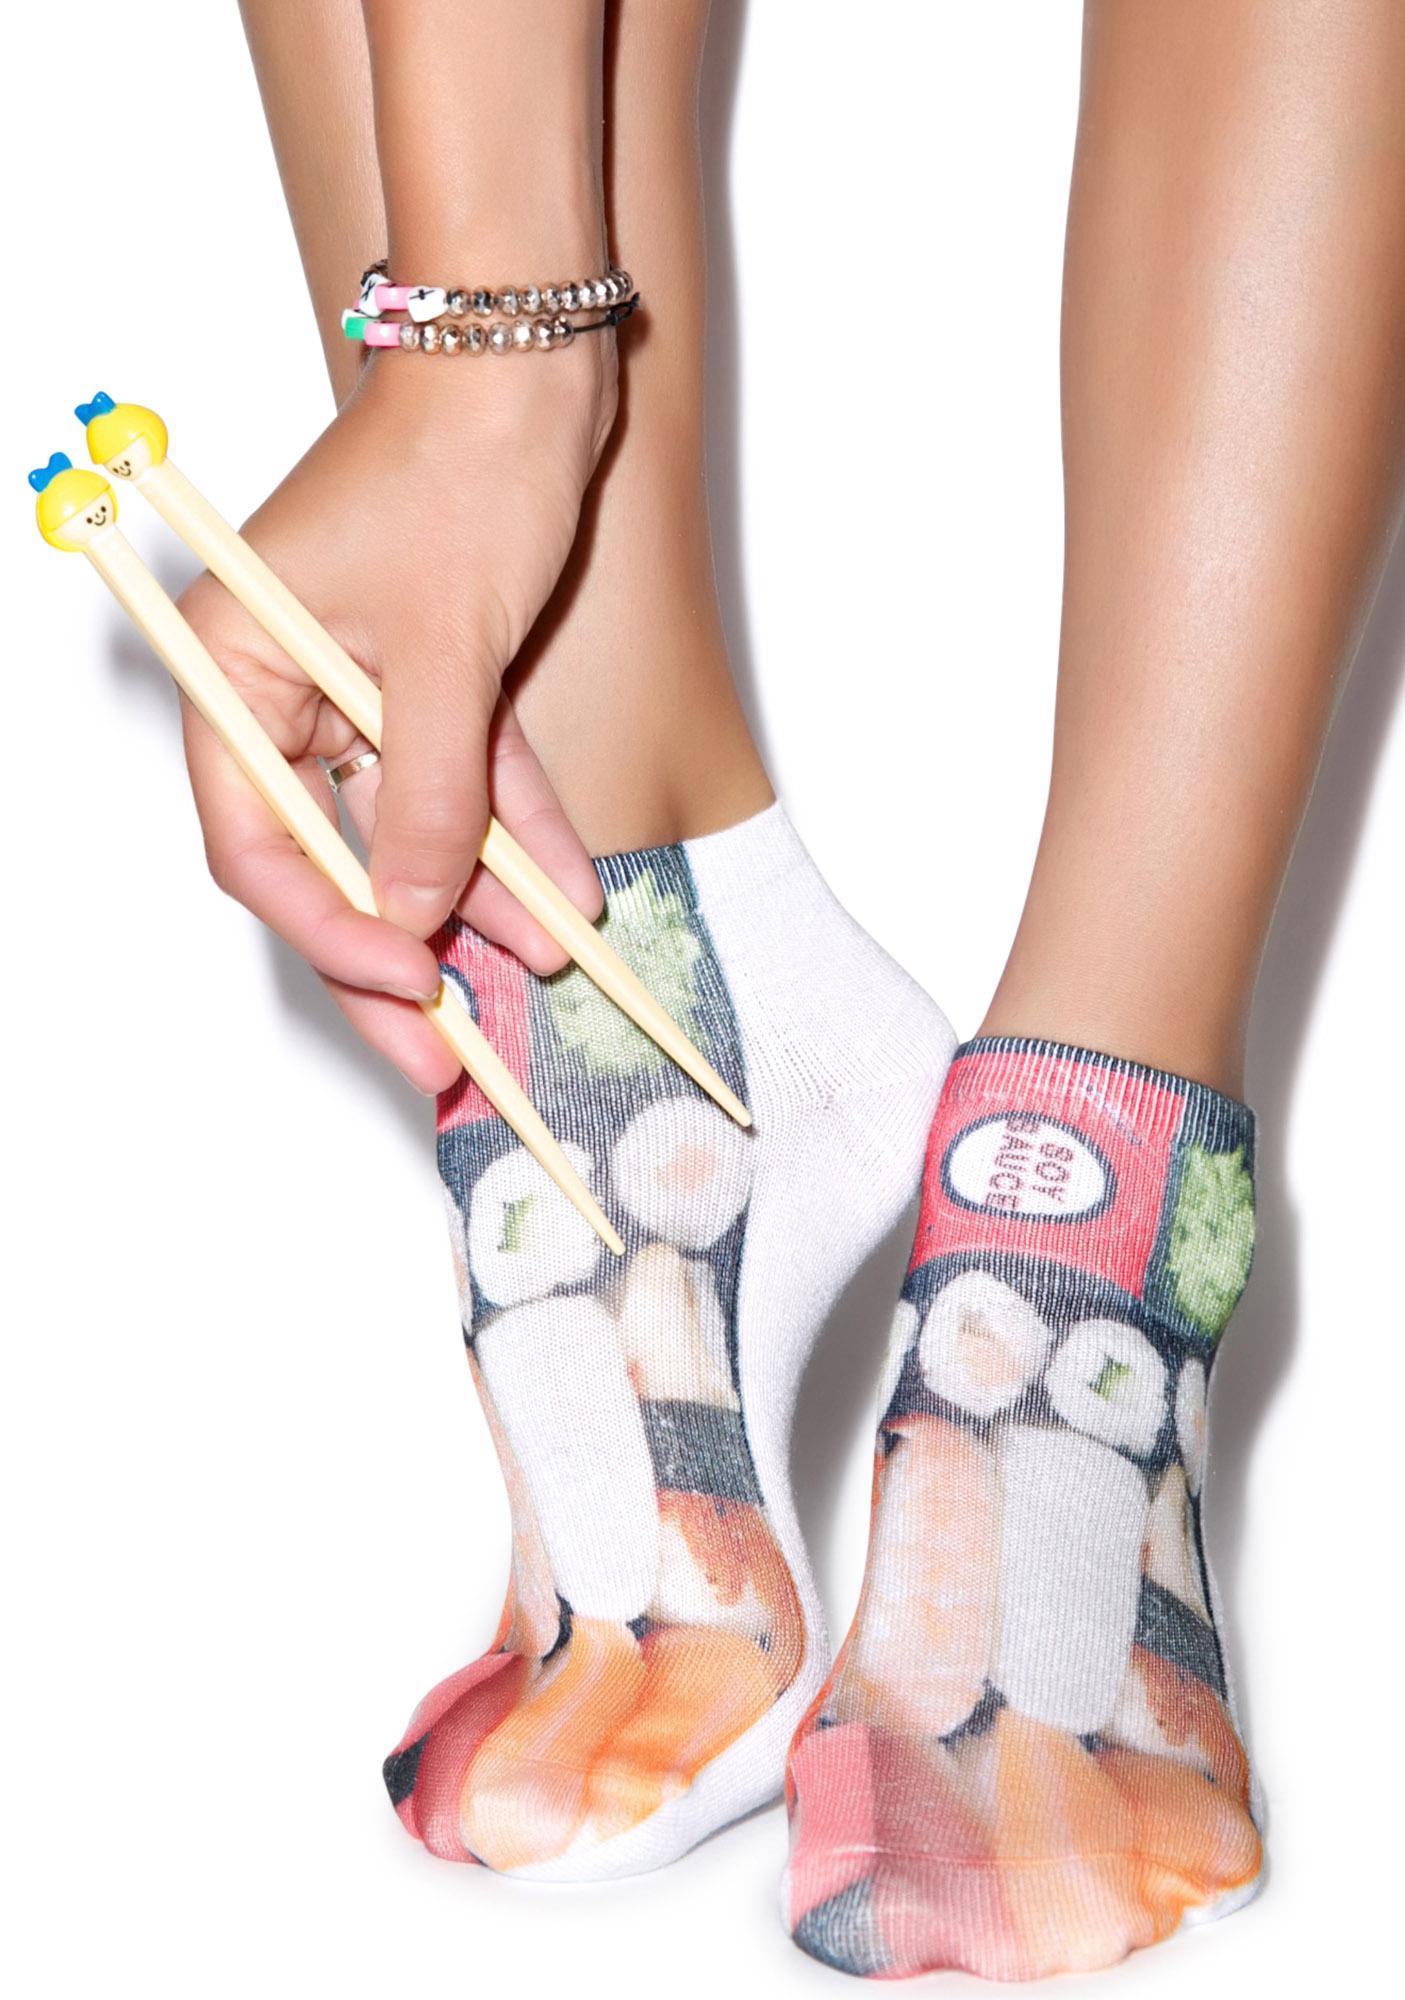 We Like It Raw Ankle Socks